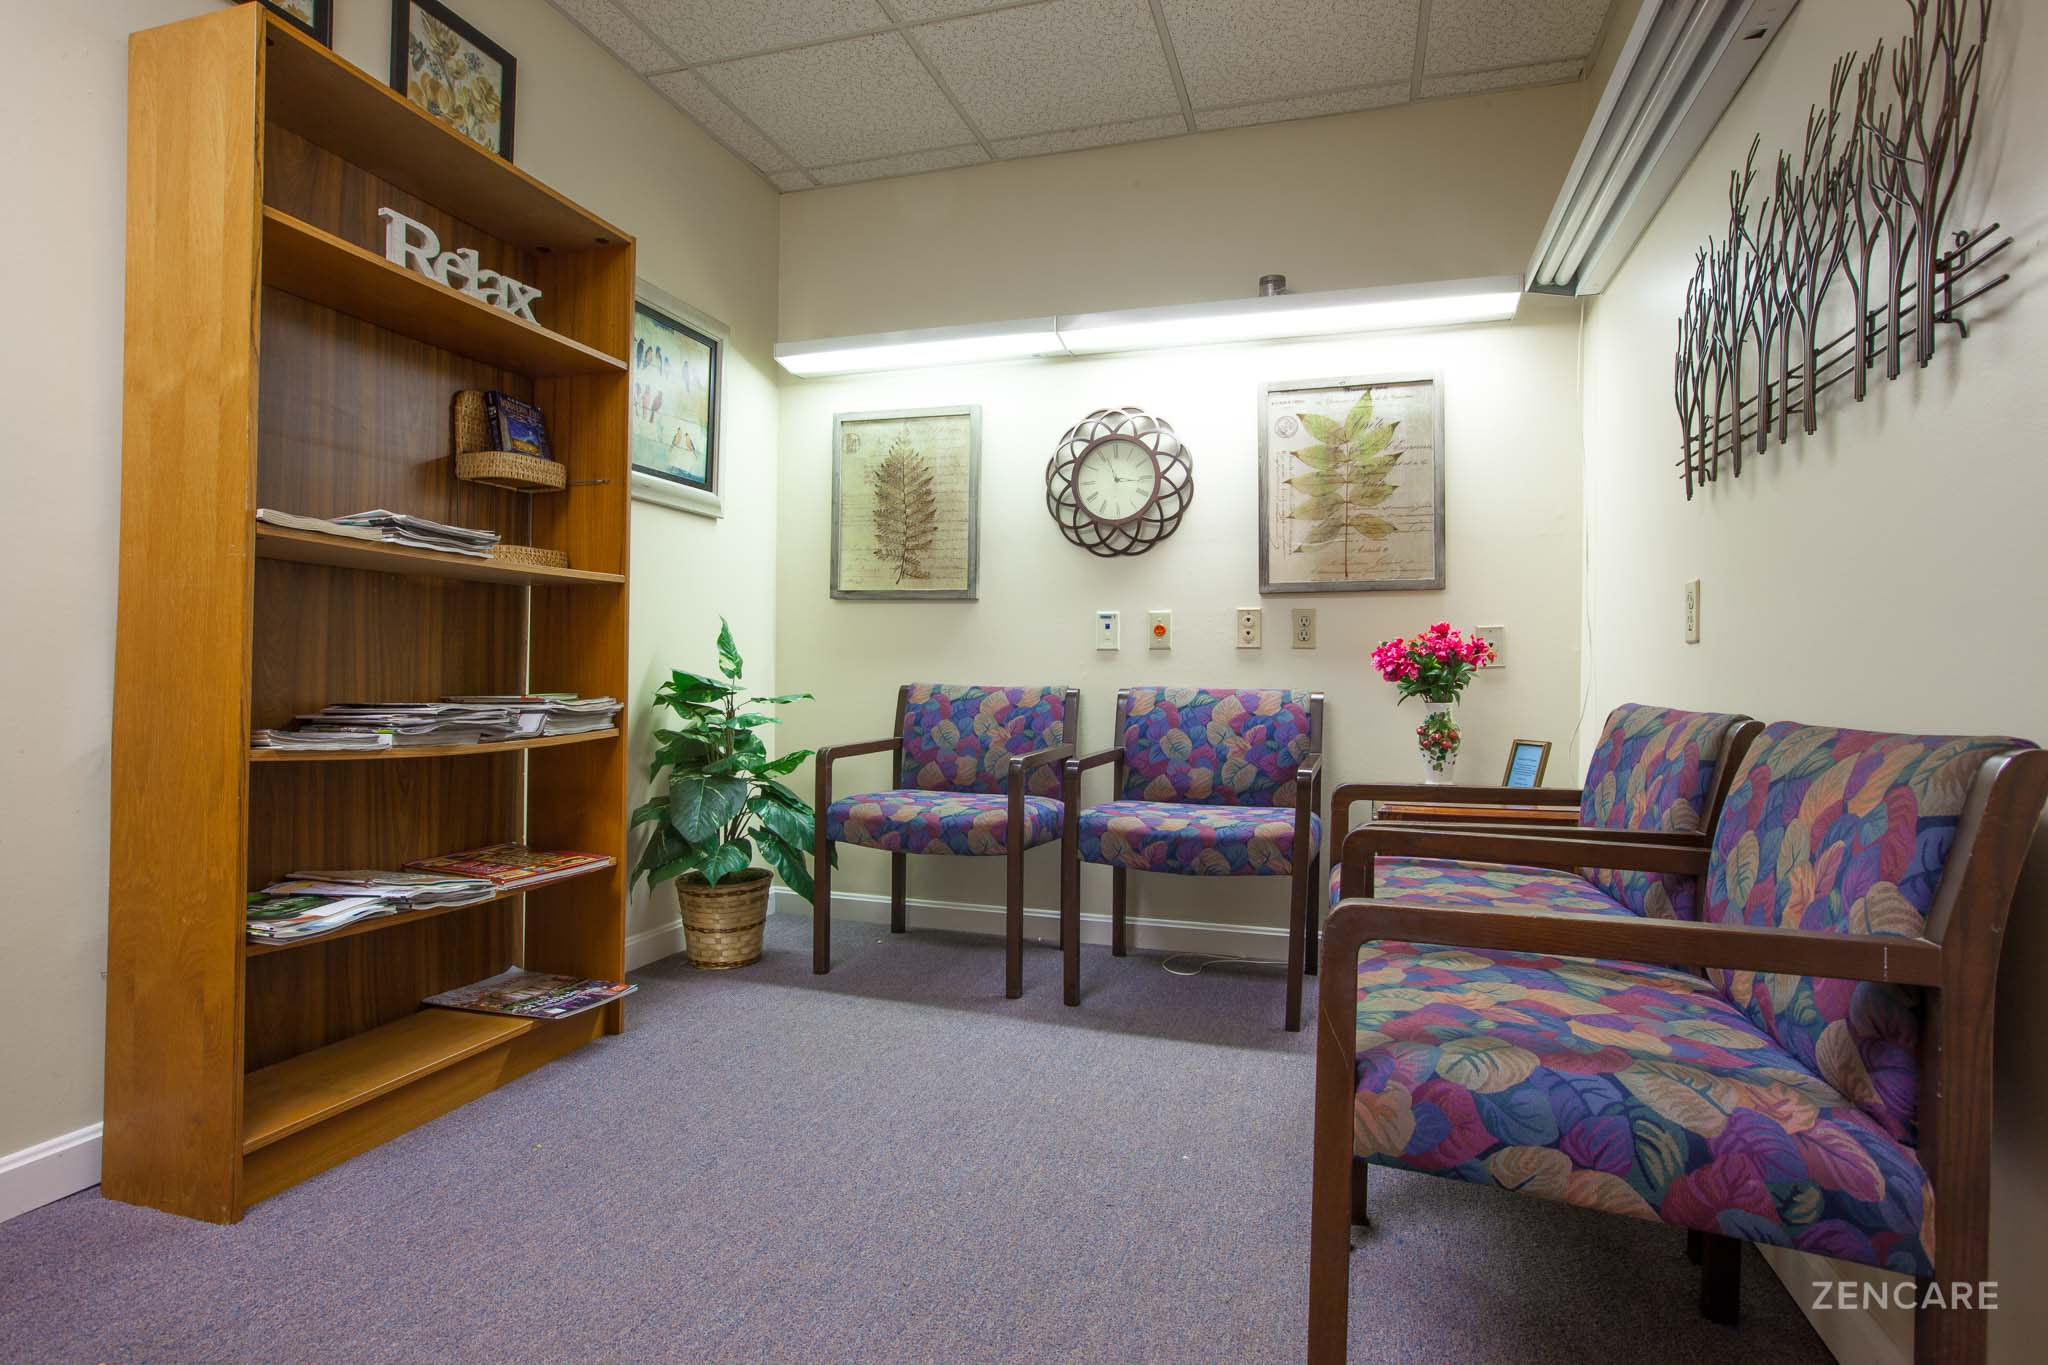 Cindy+Jones,+LMHC_Zencare_Therapist+in+Pawtucket-1.jpg